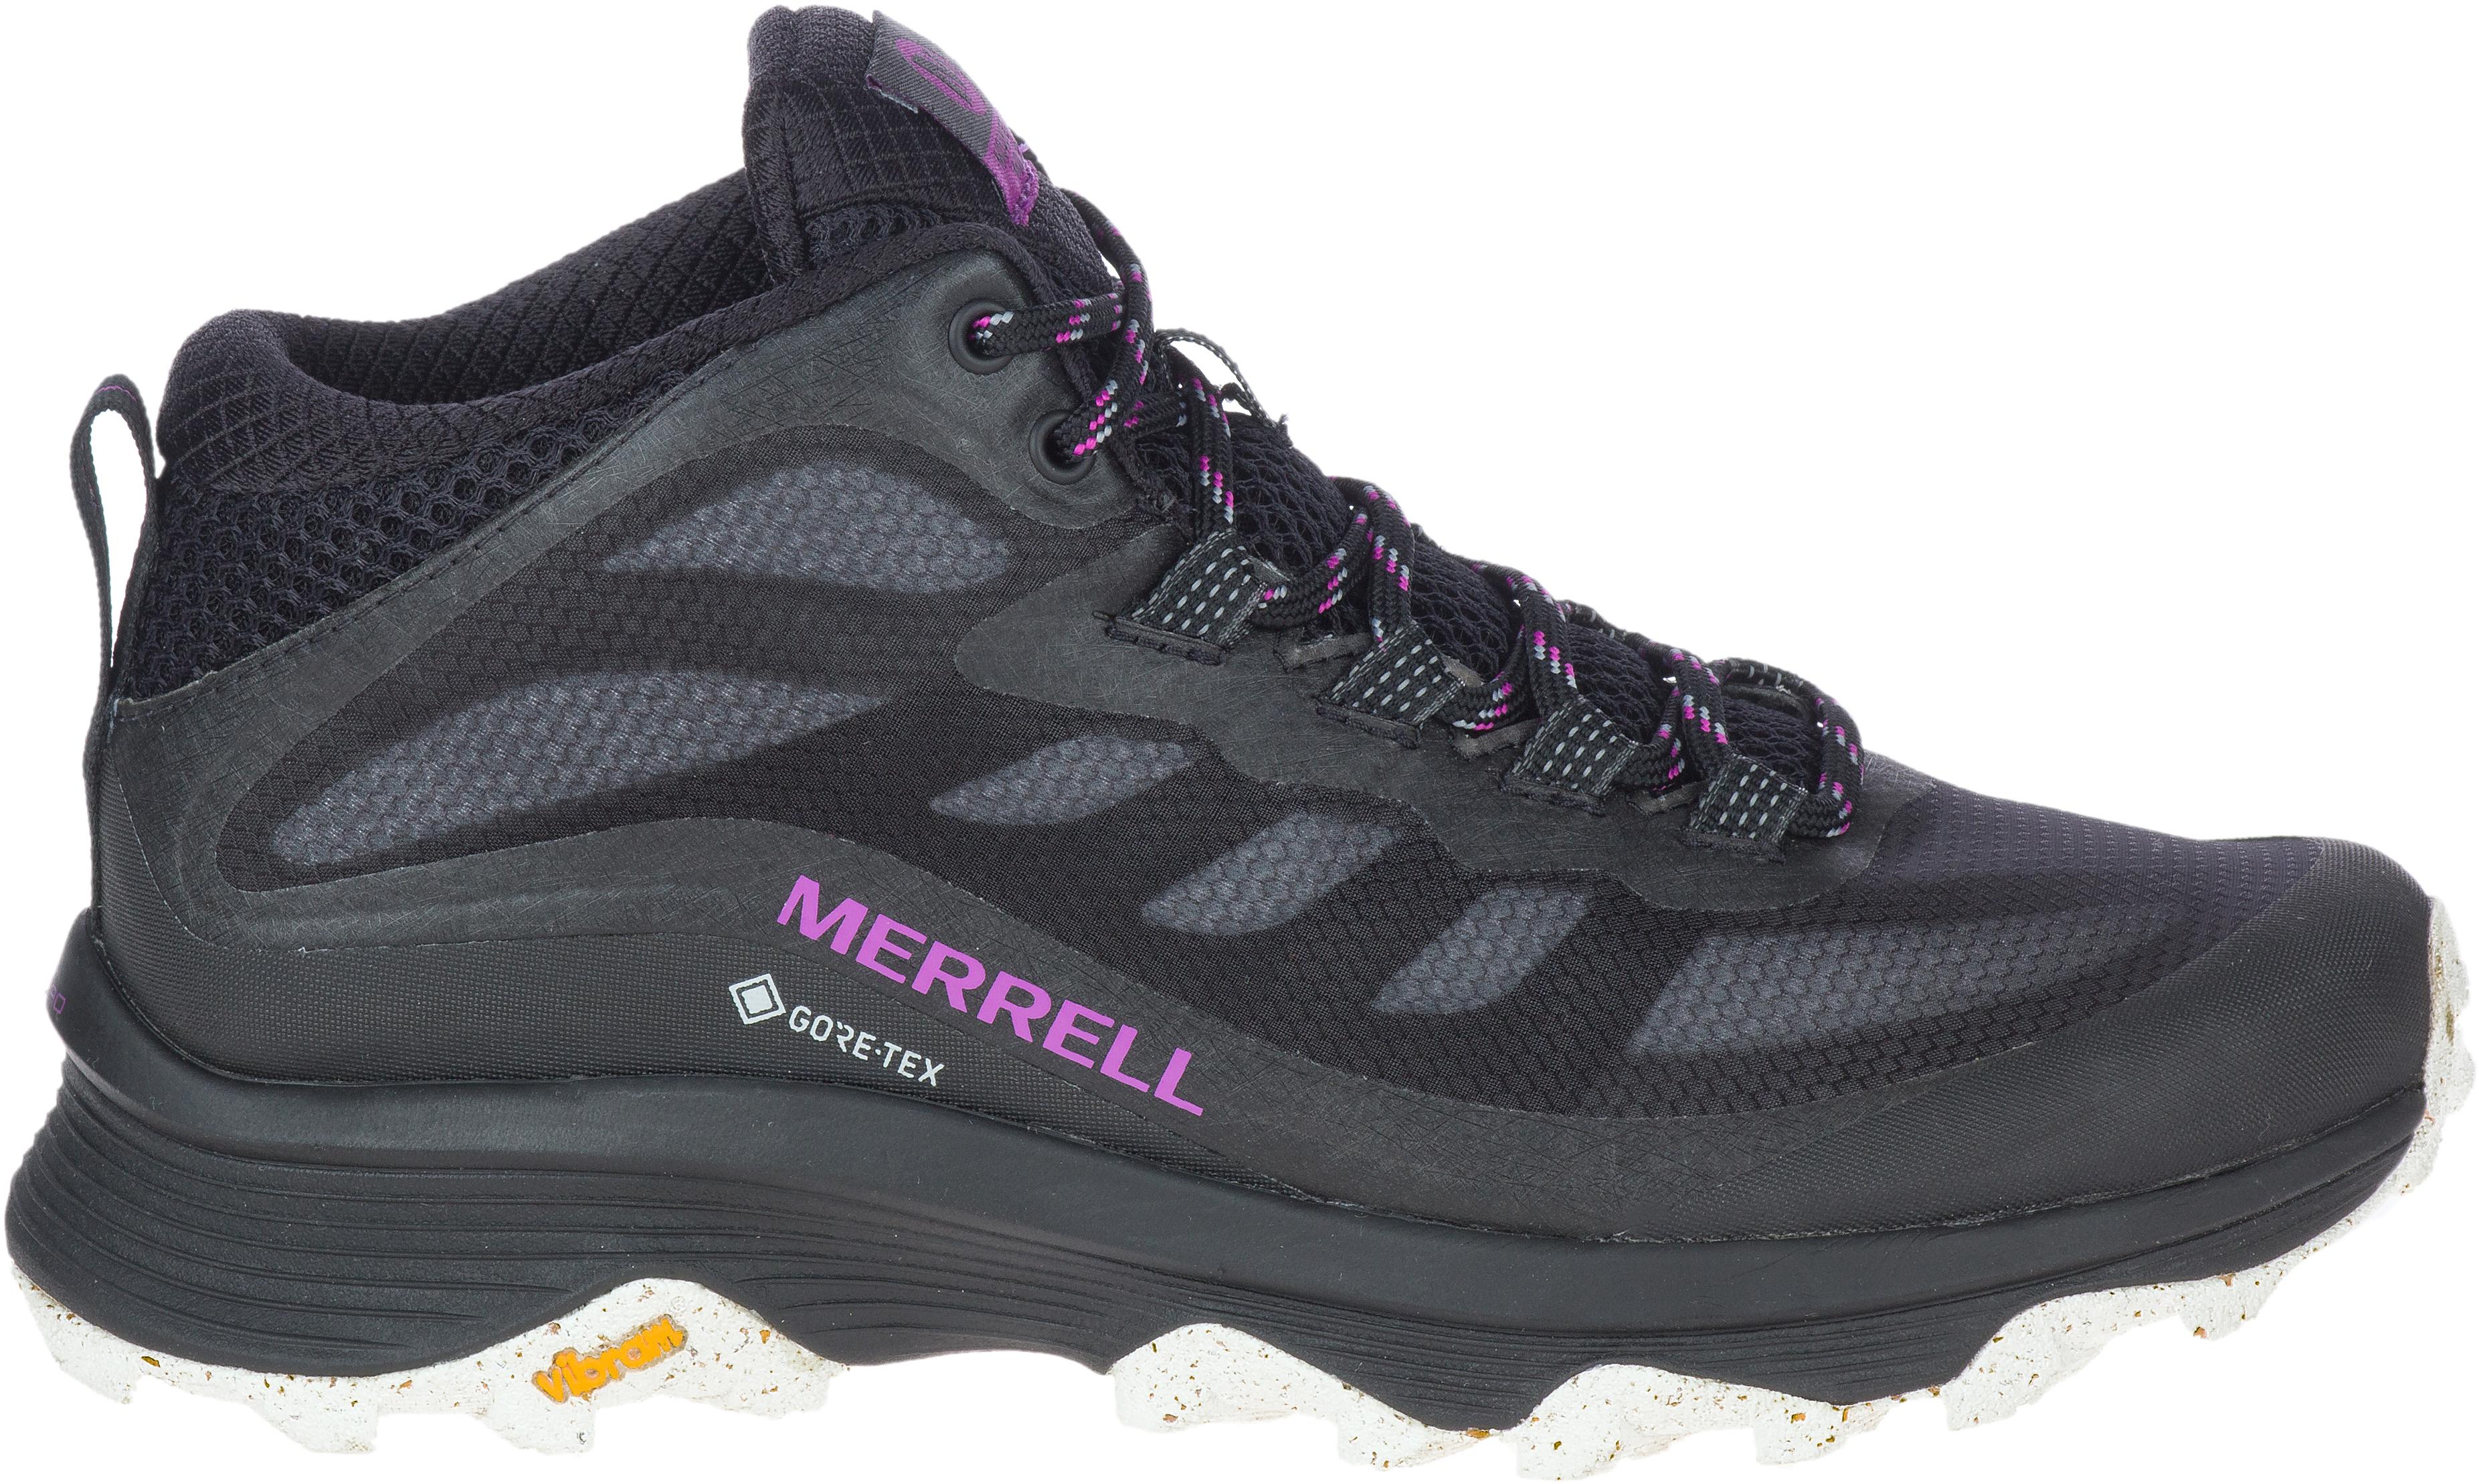 Merrell Moab Speed Mid GORE-TEX women's walking boots (Merrell/PA)